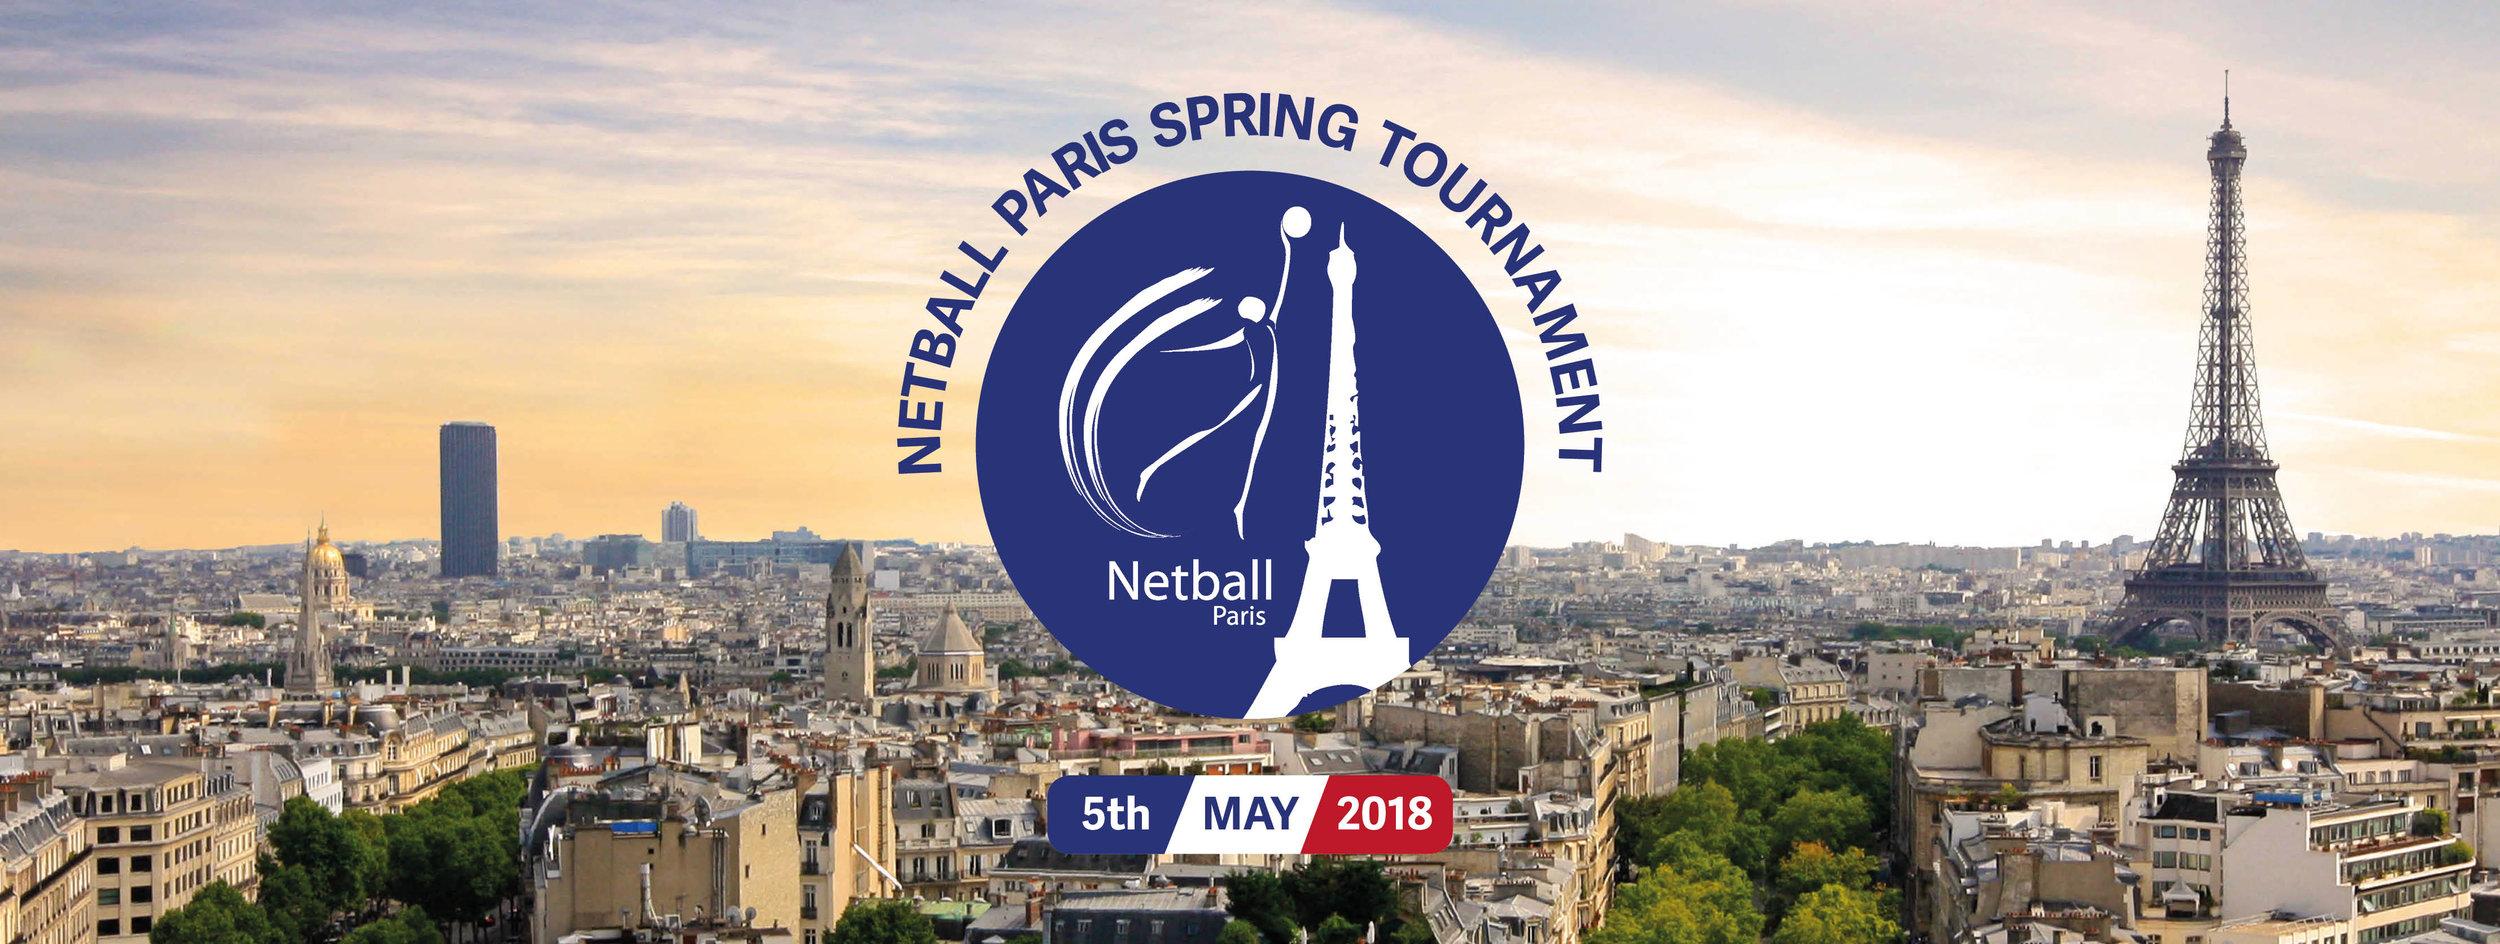 Netball Paris Spring Tournament 2018.jpg